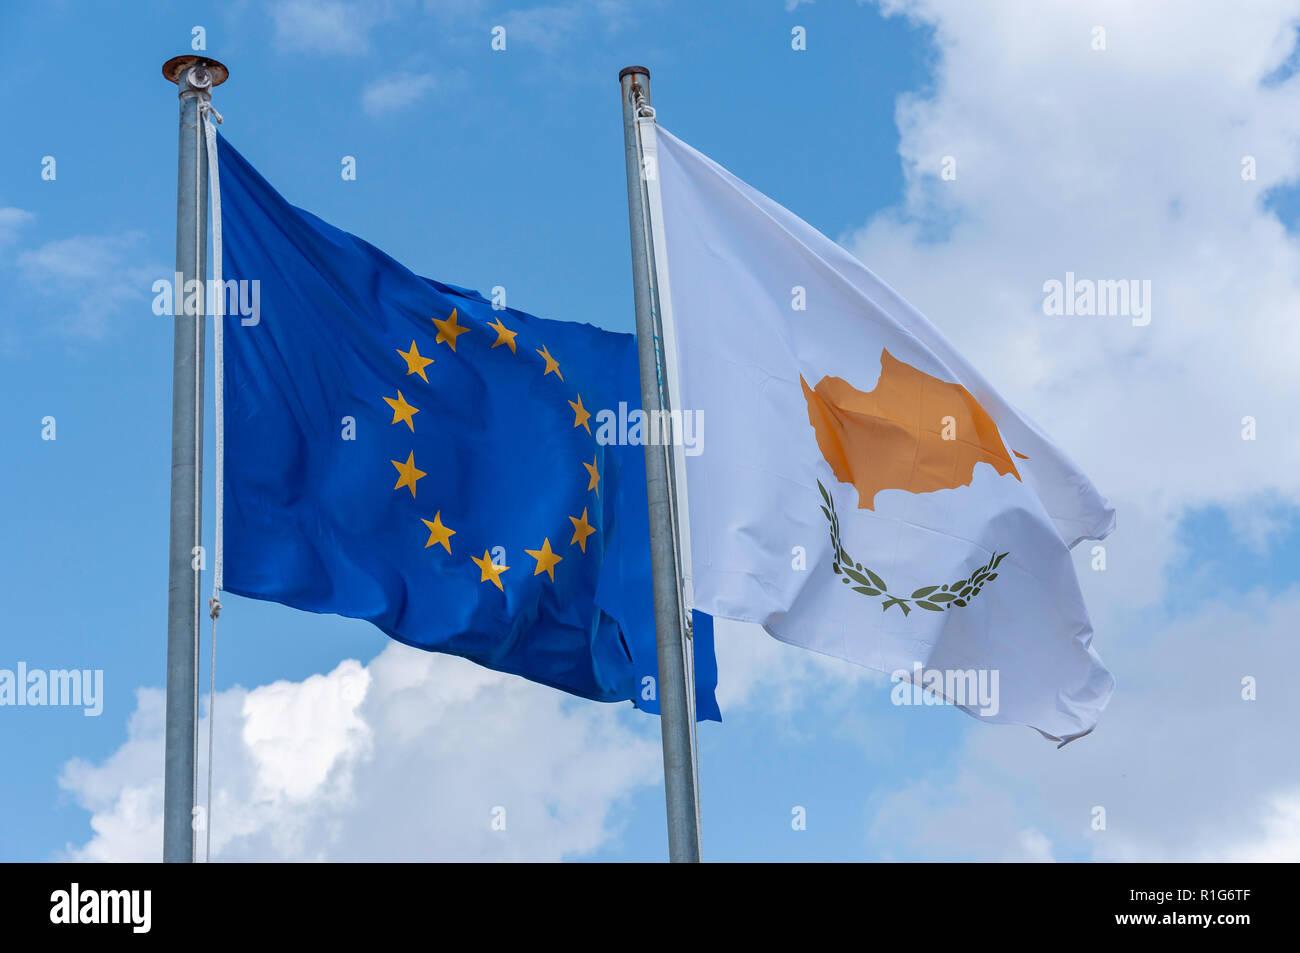 The European Union and Cyprus flag flying on flagpole, Kouklia, Pafos District, Republic of Cyprus - Stock Image